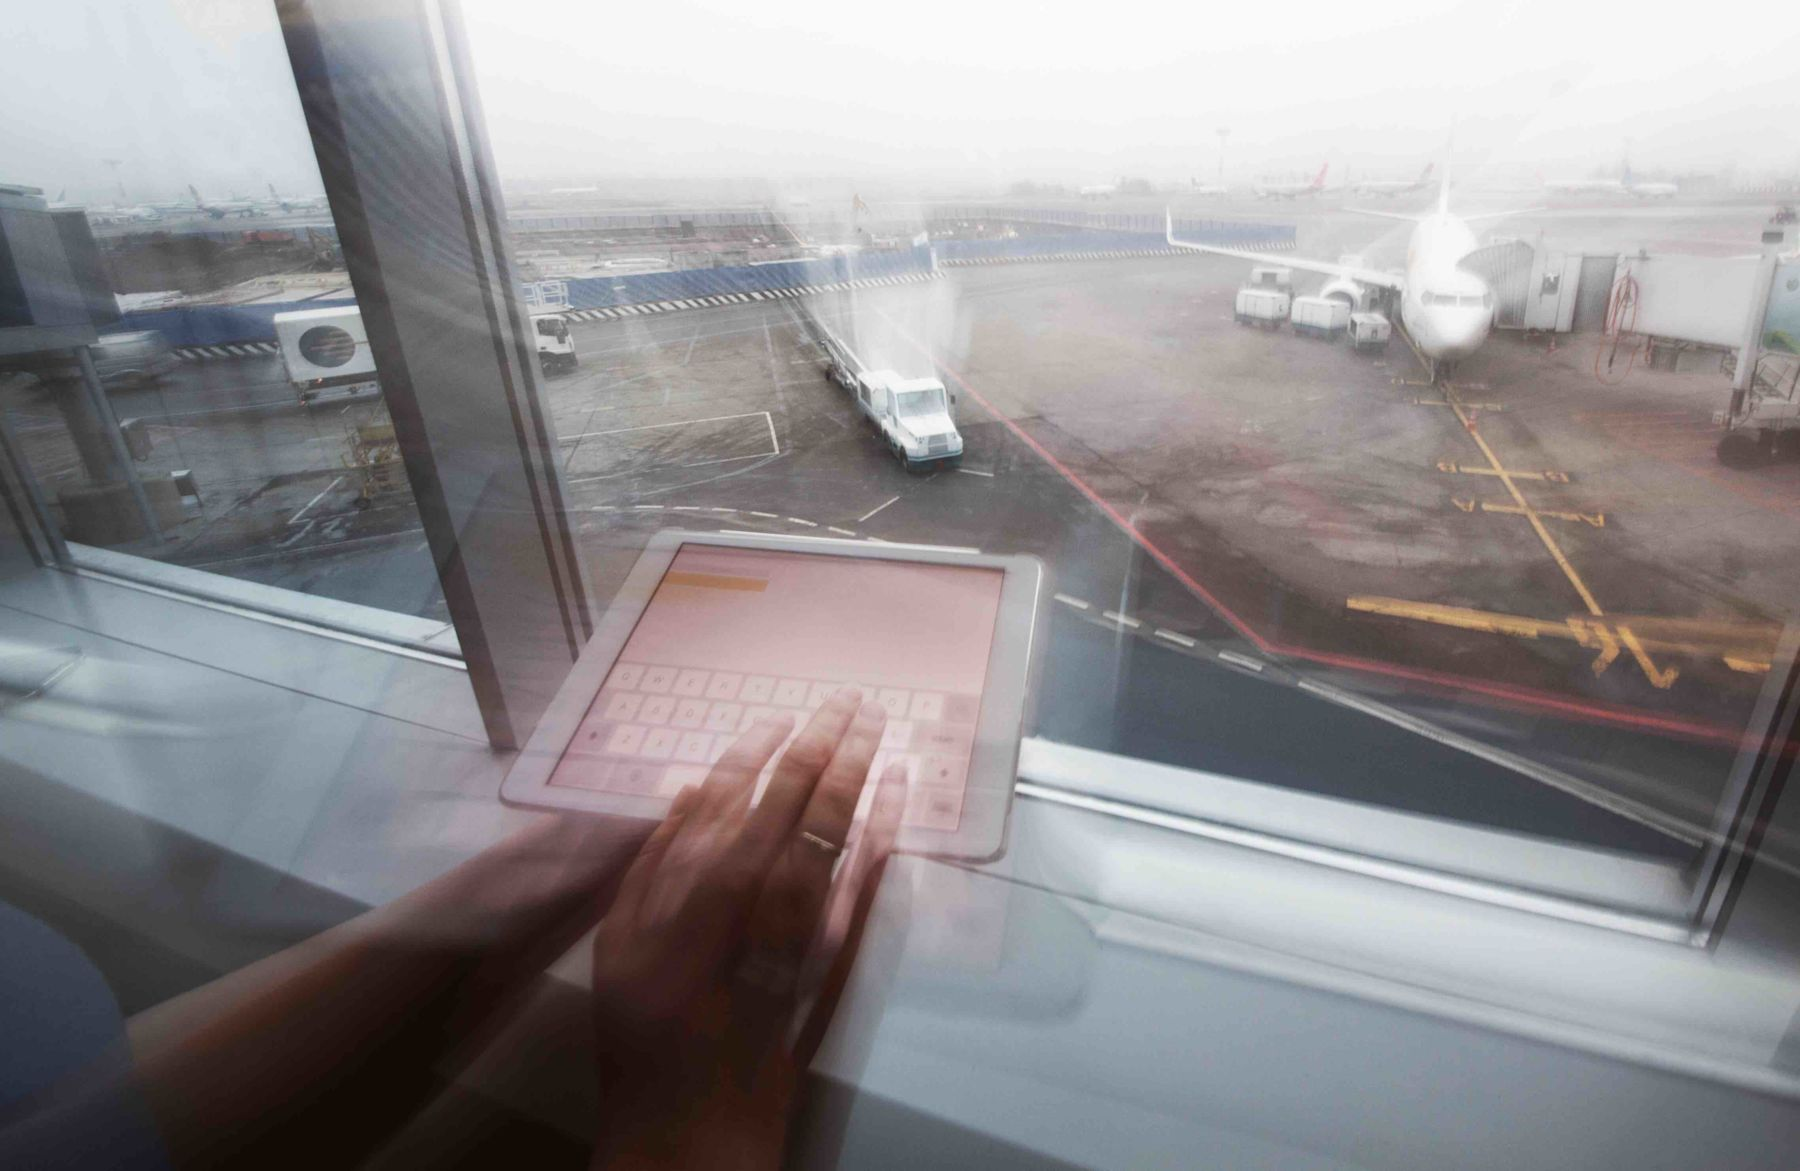 Ipad airport